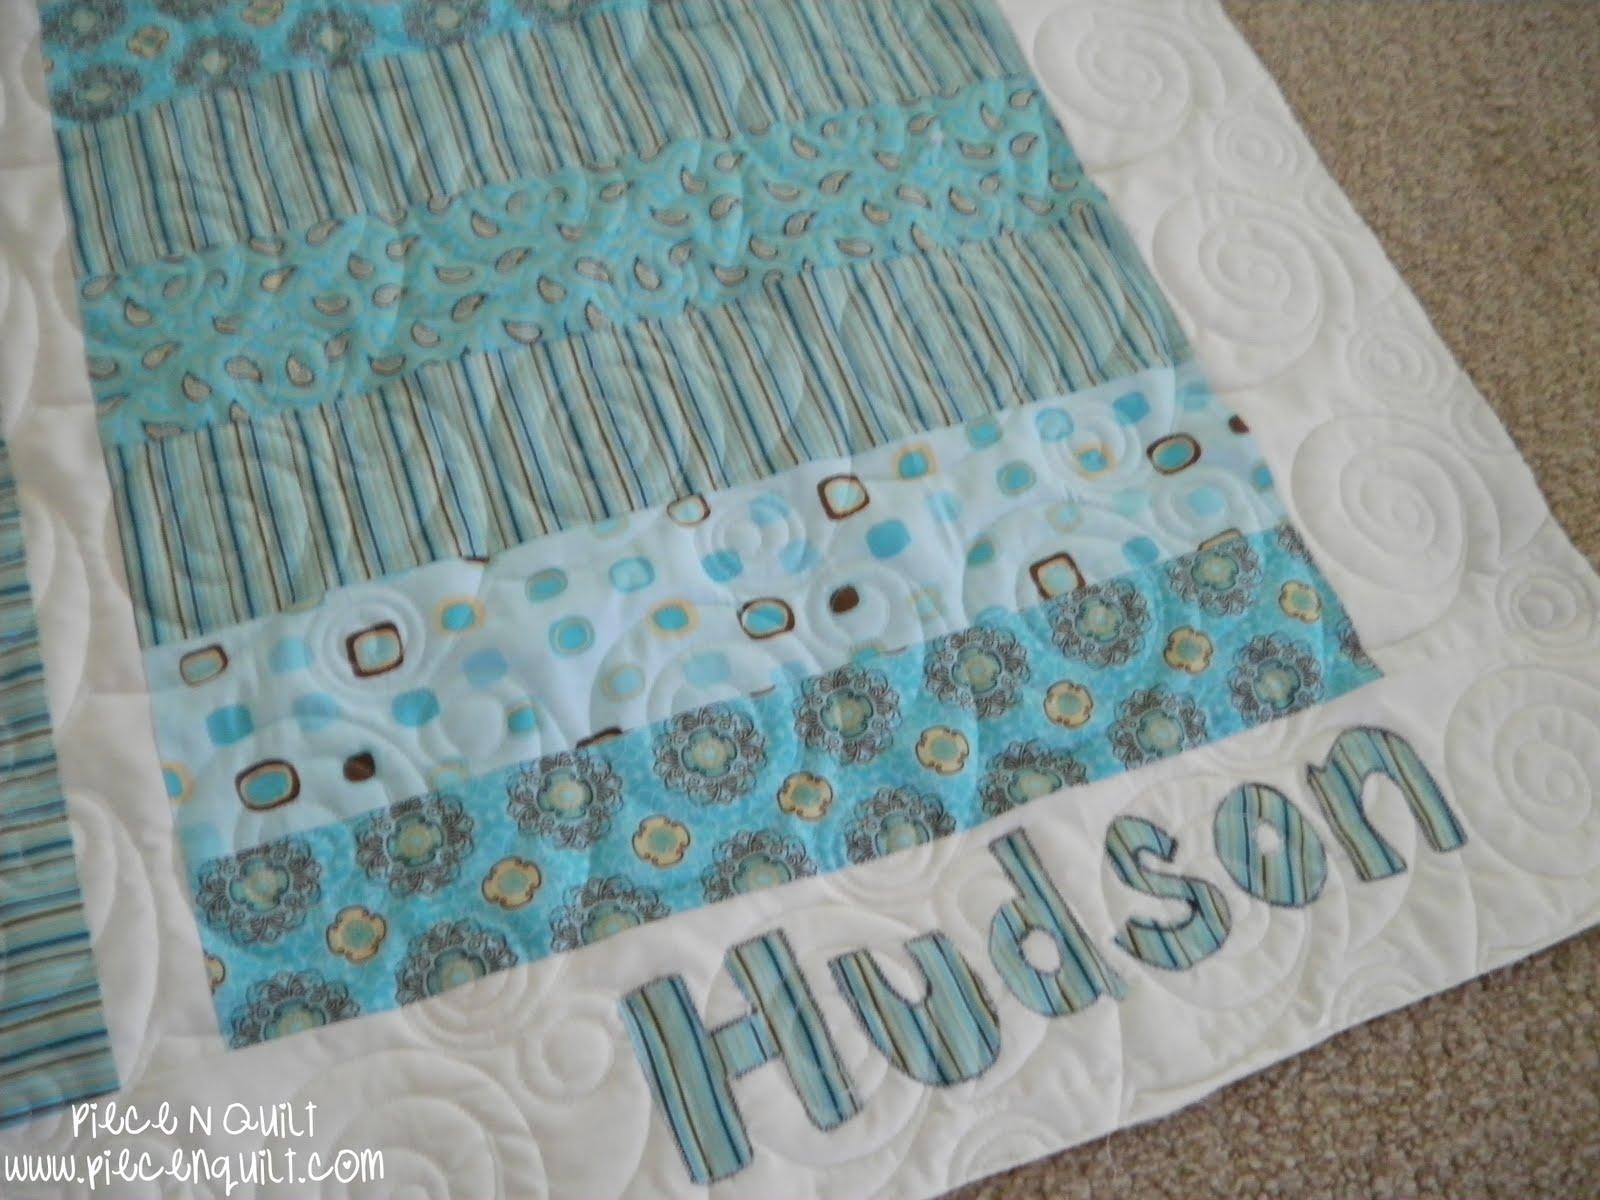 Piece N Quilt Baby Boy Quilts